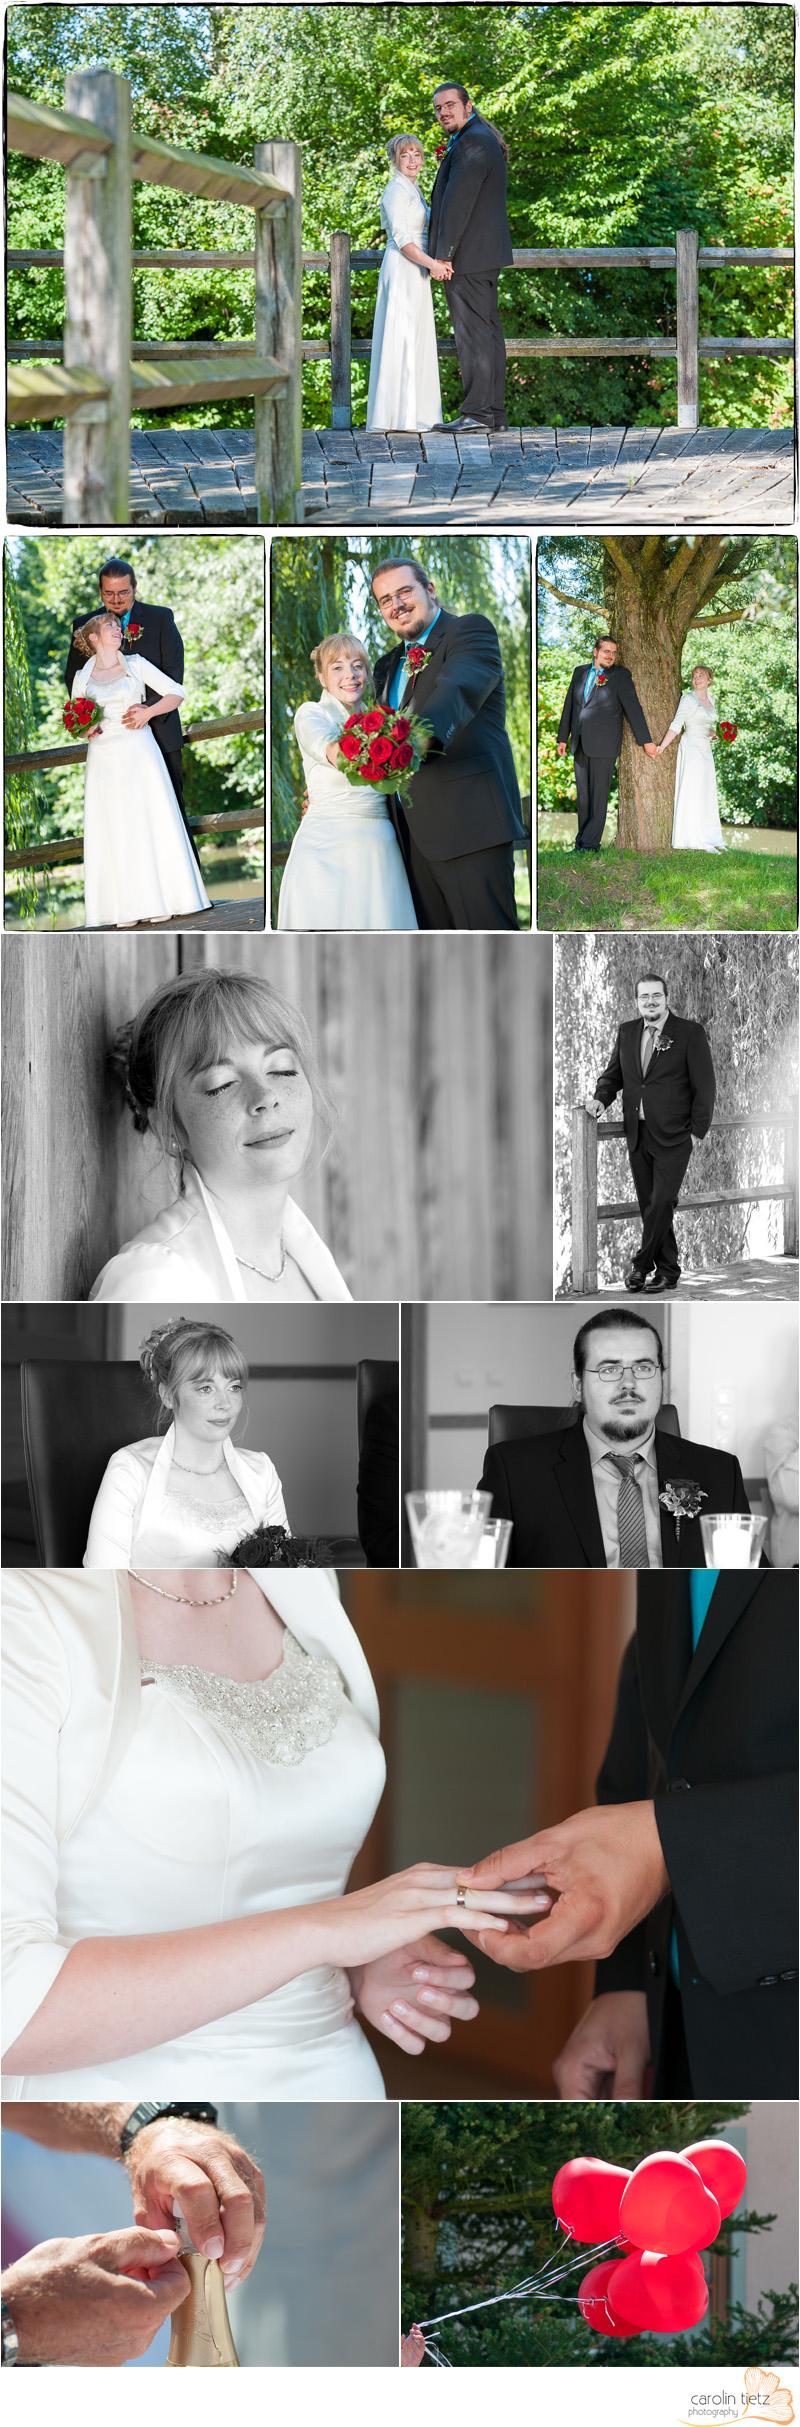 Blog Collage-1345463581553